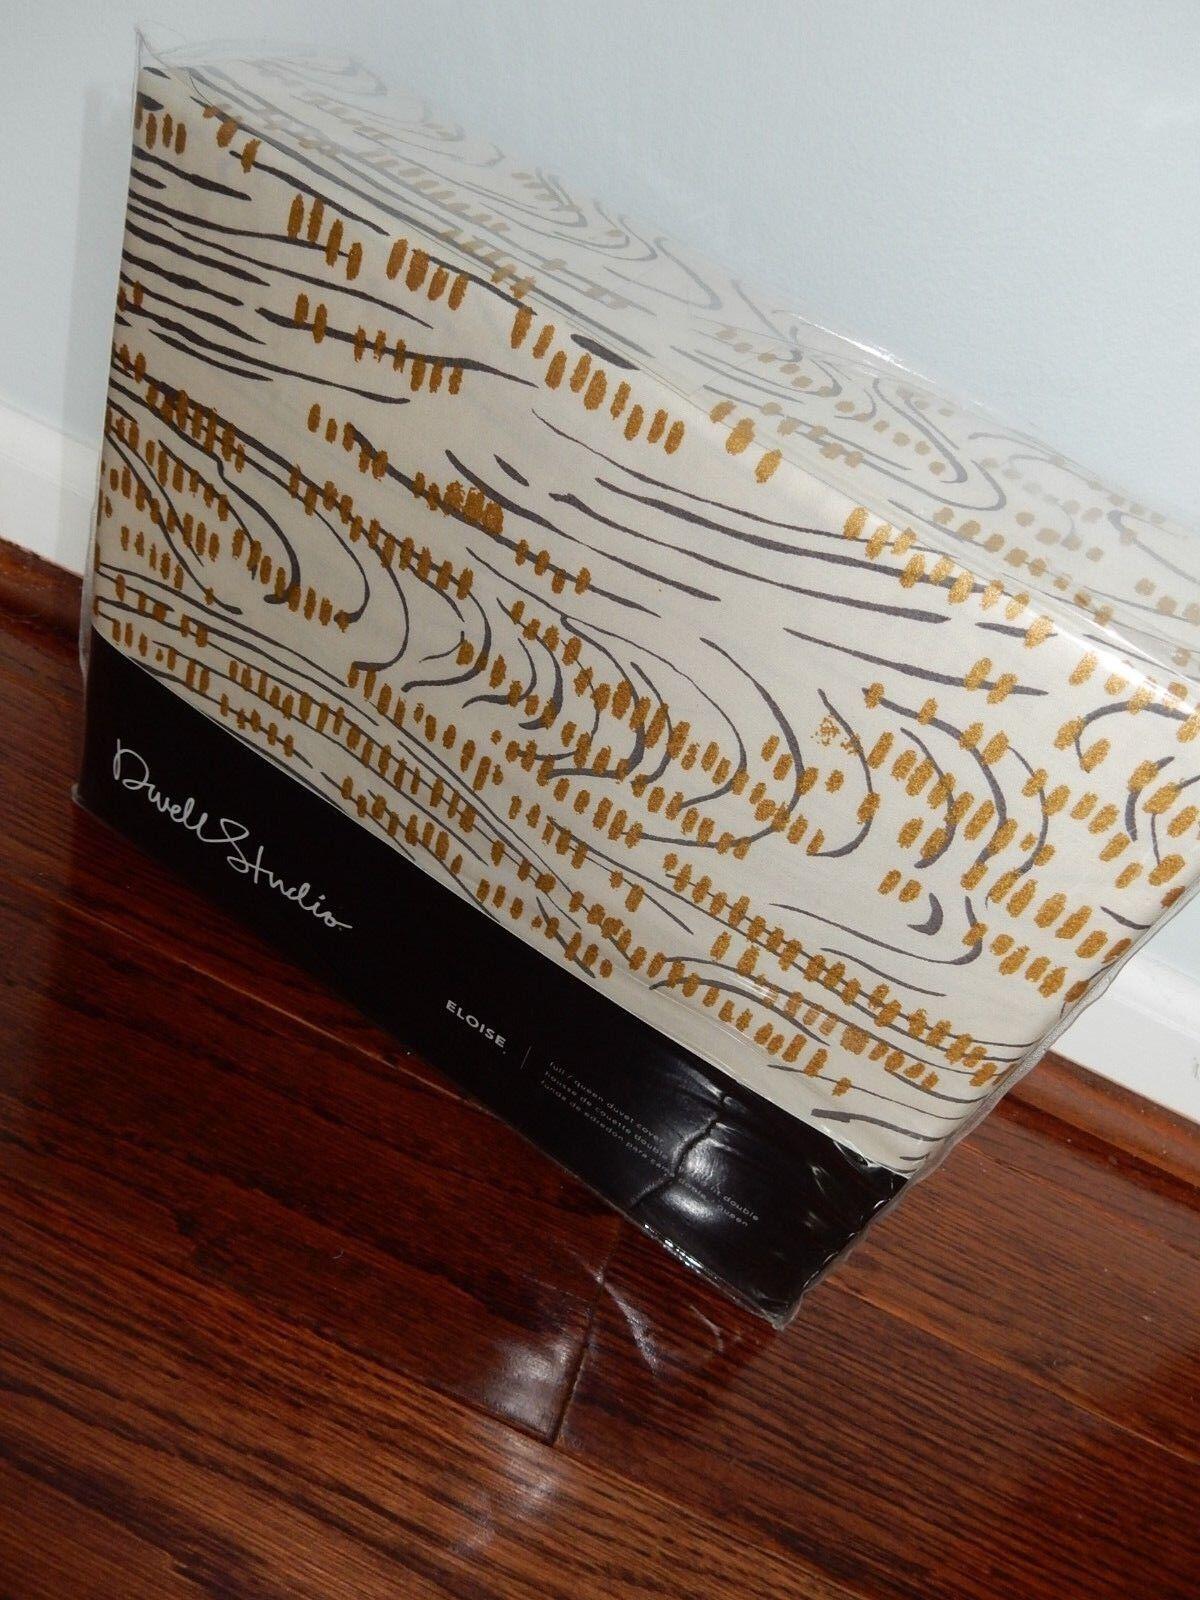 DWELL STUDIO Eloise QUEEN DUVET COVER Metallic oro BRUSH STROKE Bloomie's